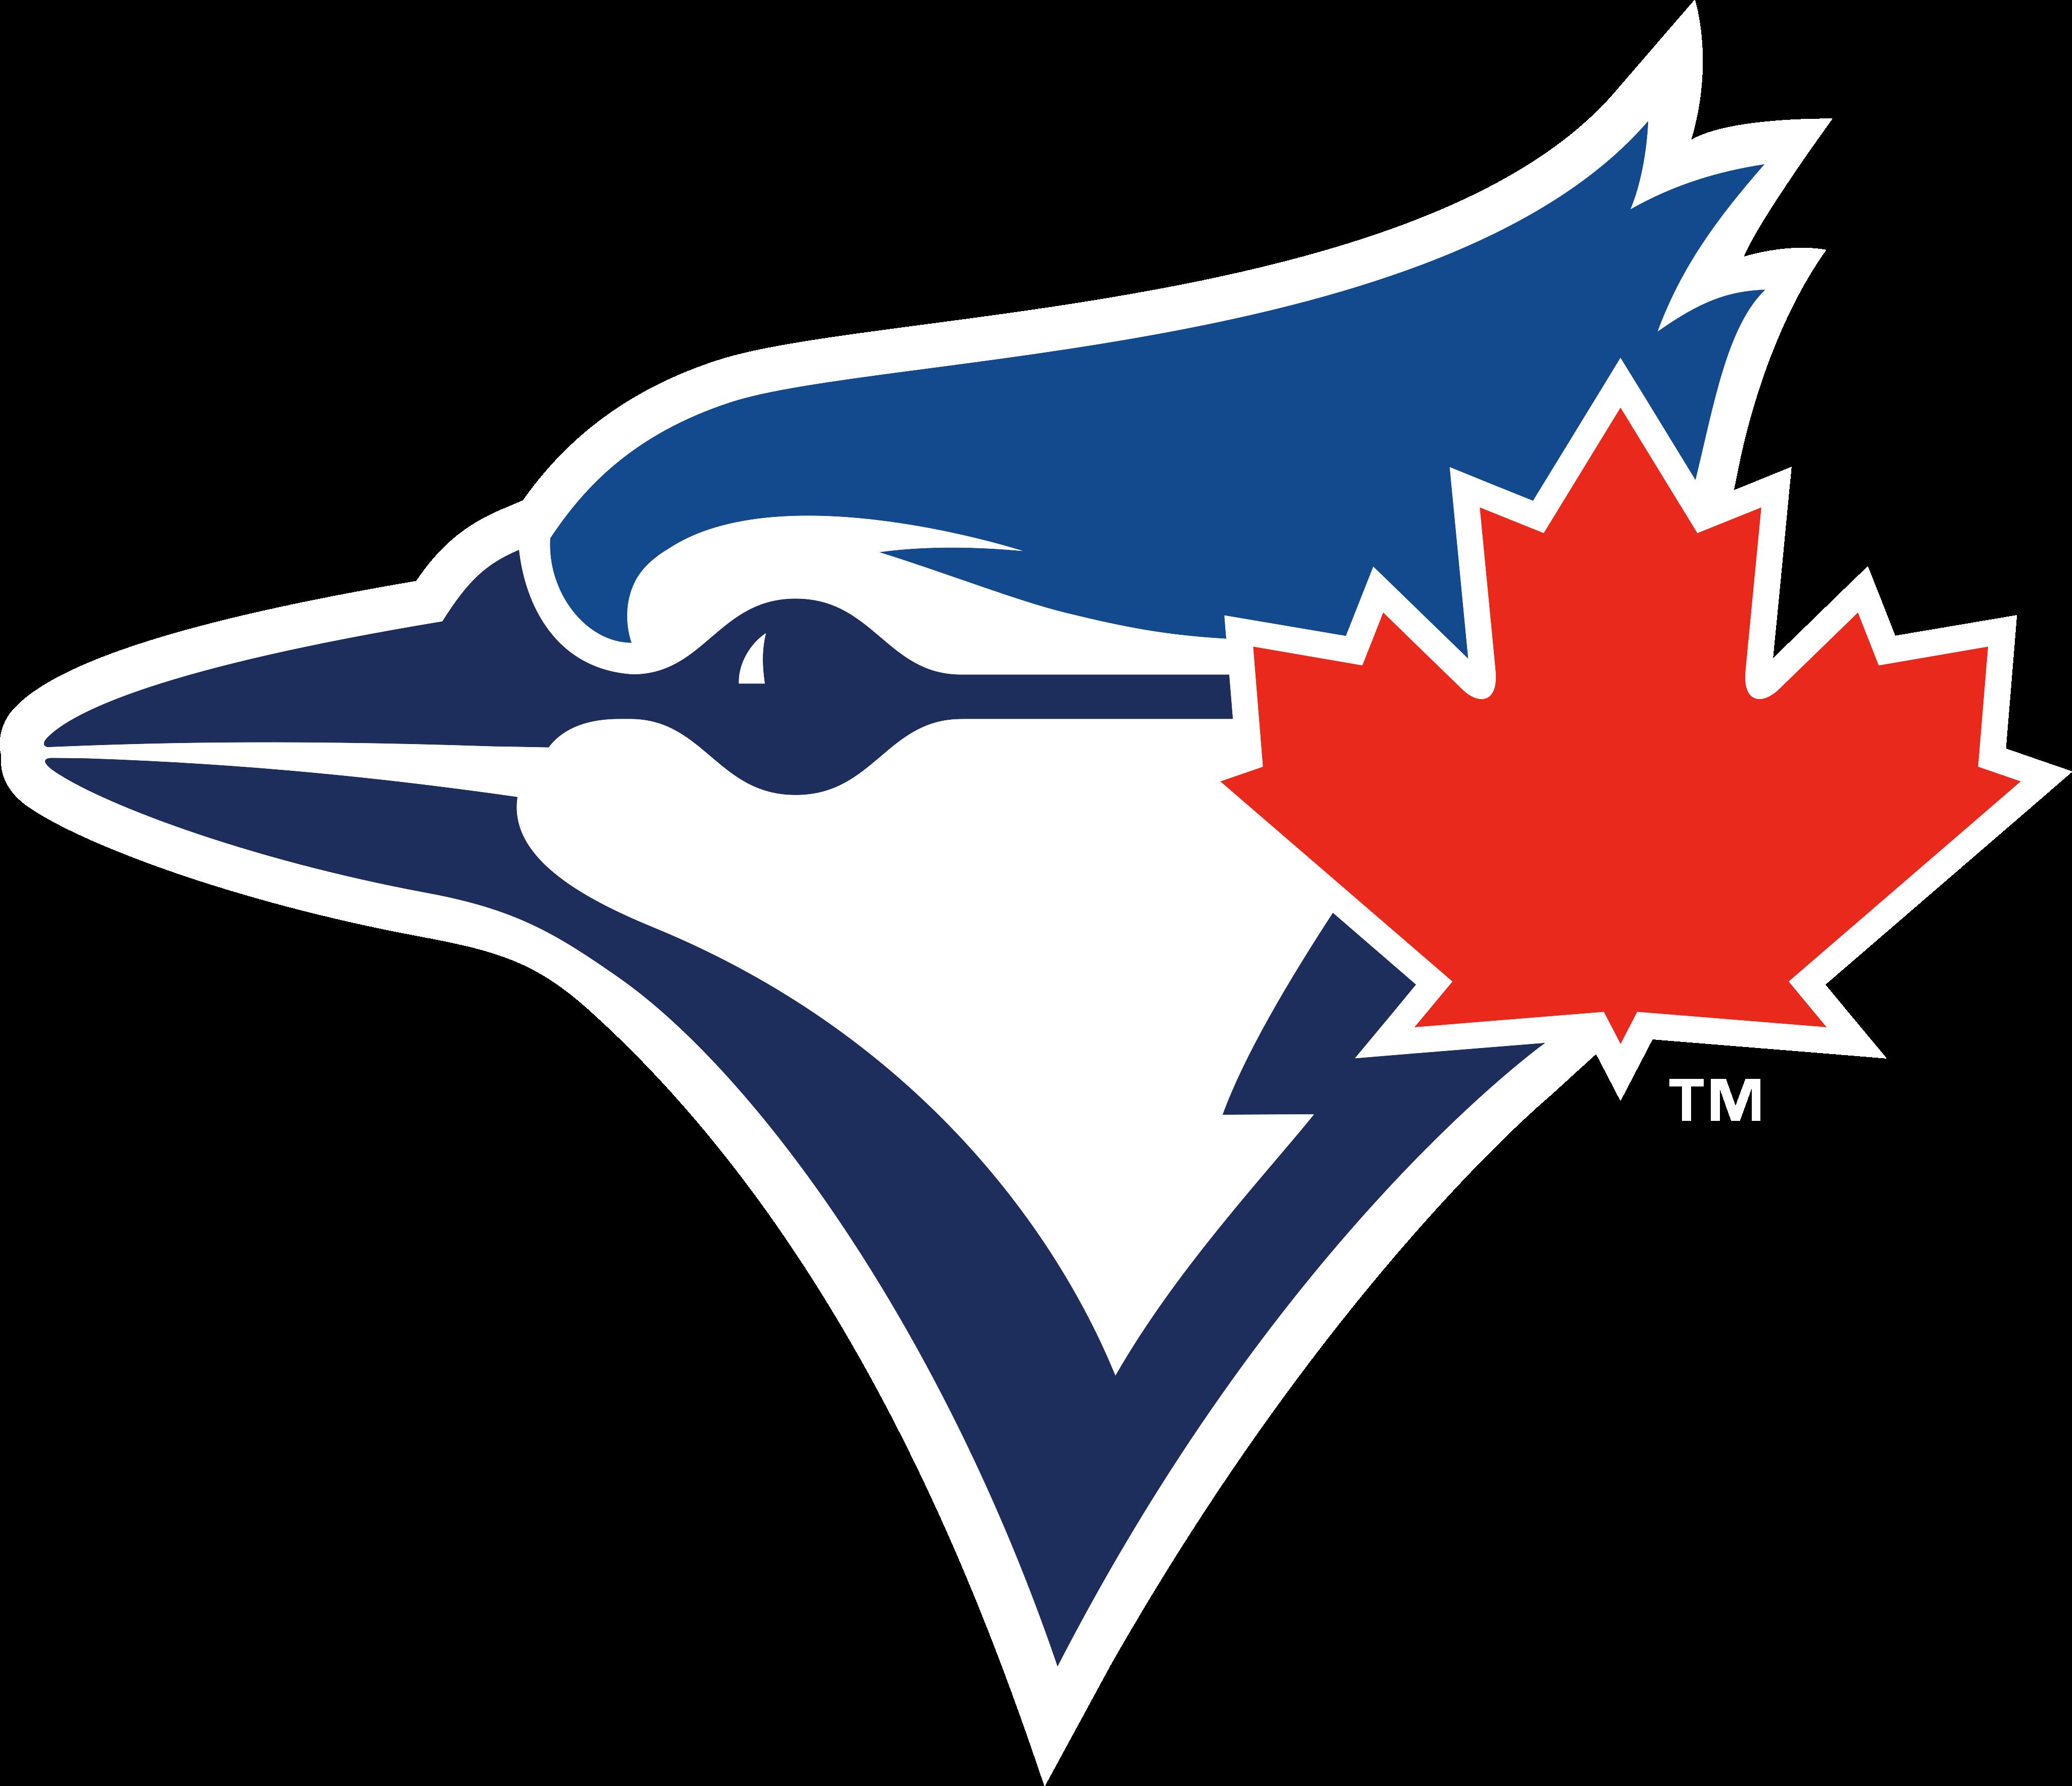 toronto blue jays logo - Toronto Blue Jays Logo